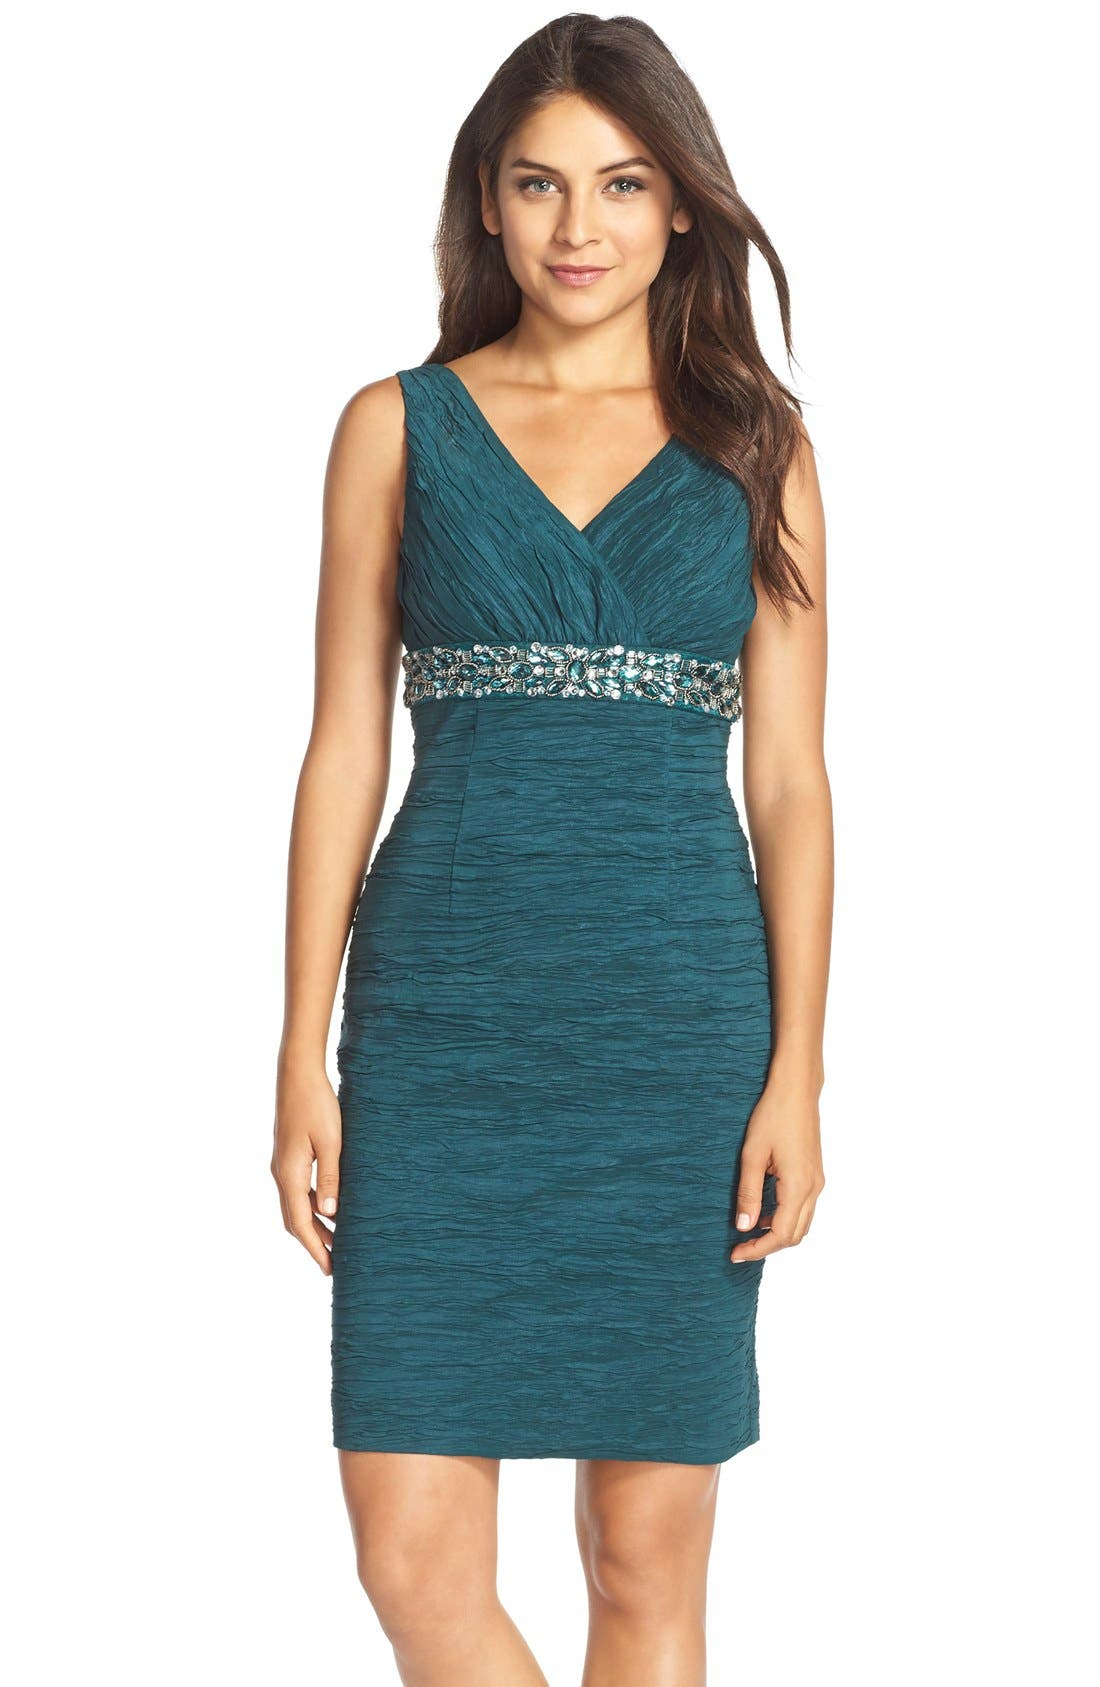 Alternate Image 1 Selected - Eliza J Embellished Waist Crinkled Taffeta Dress (Regular & Petite)